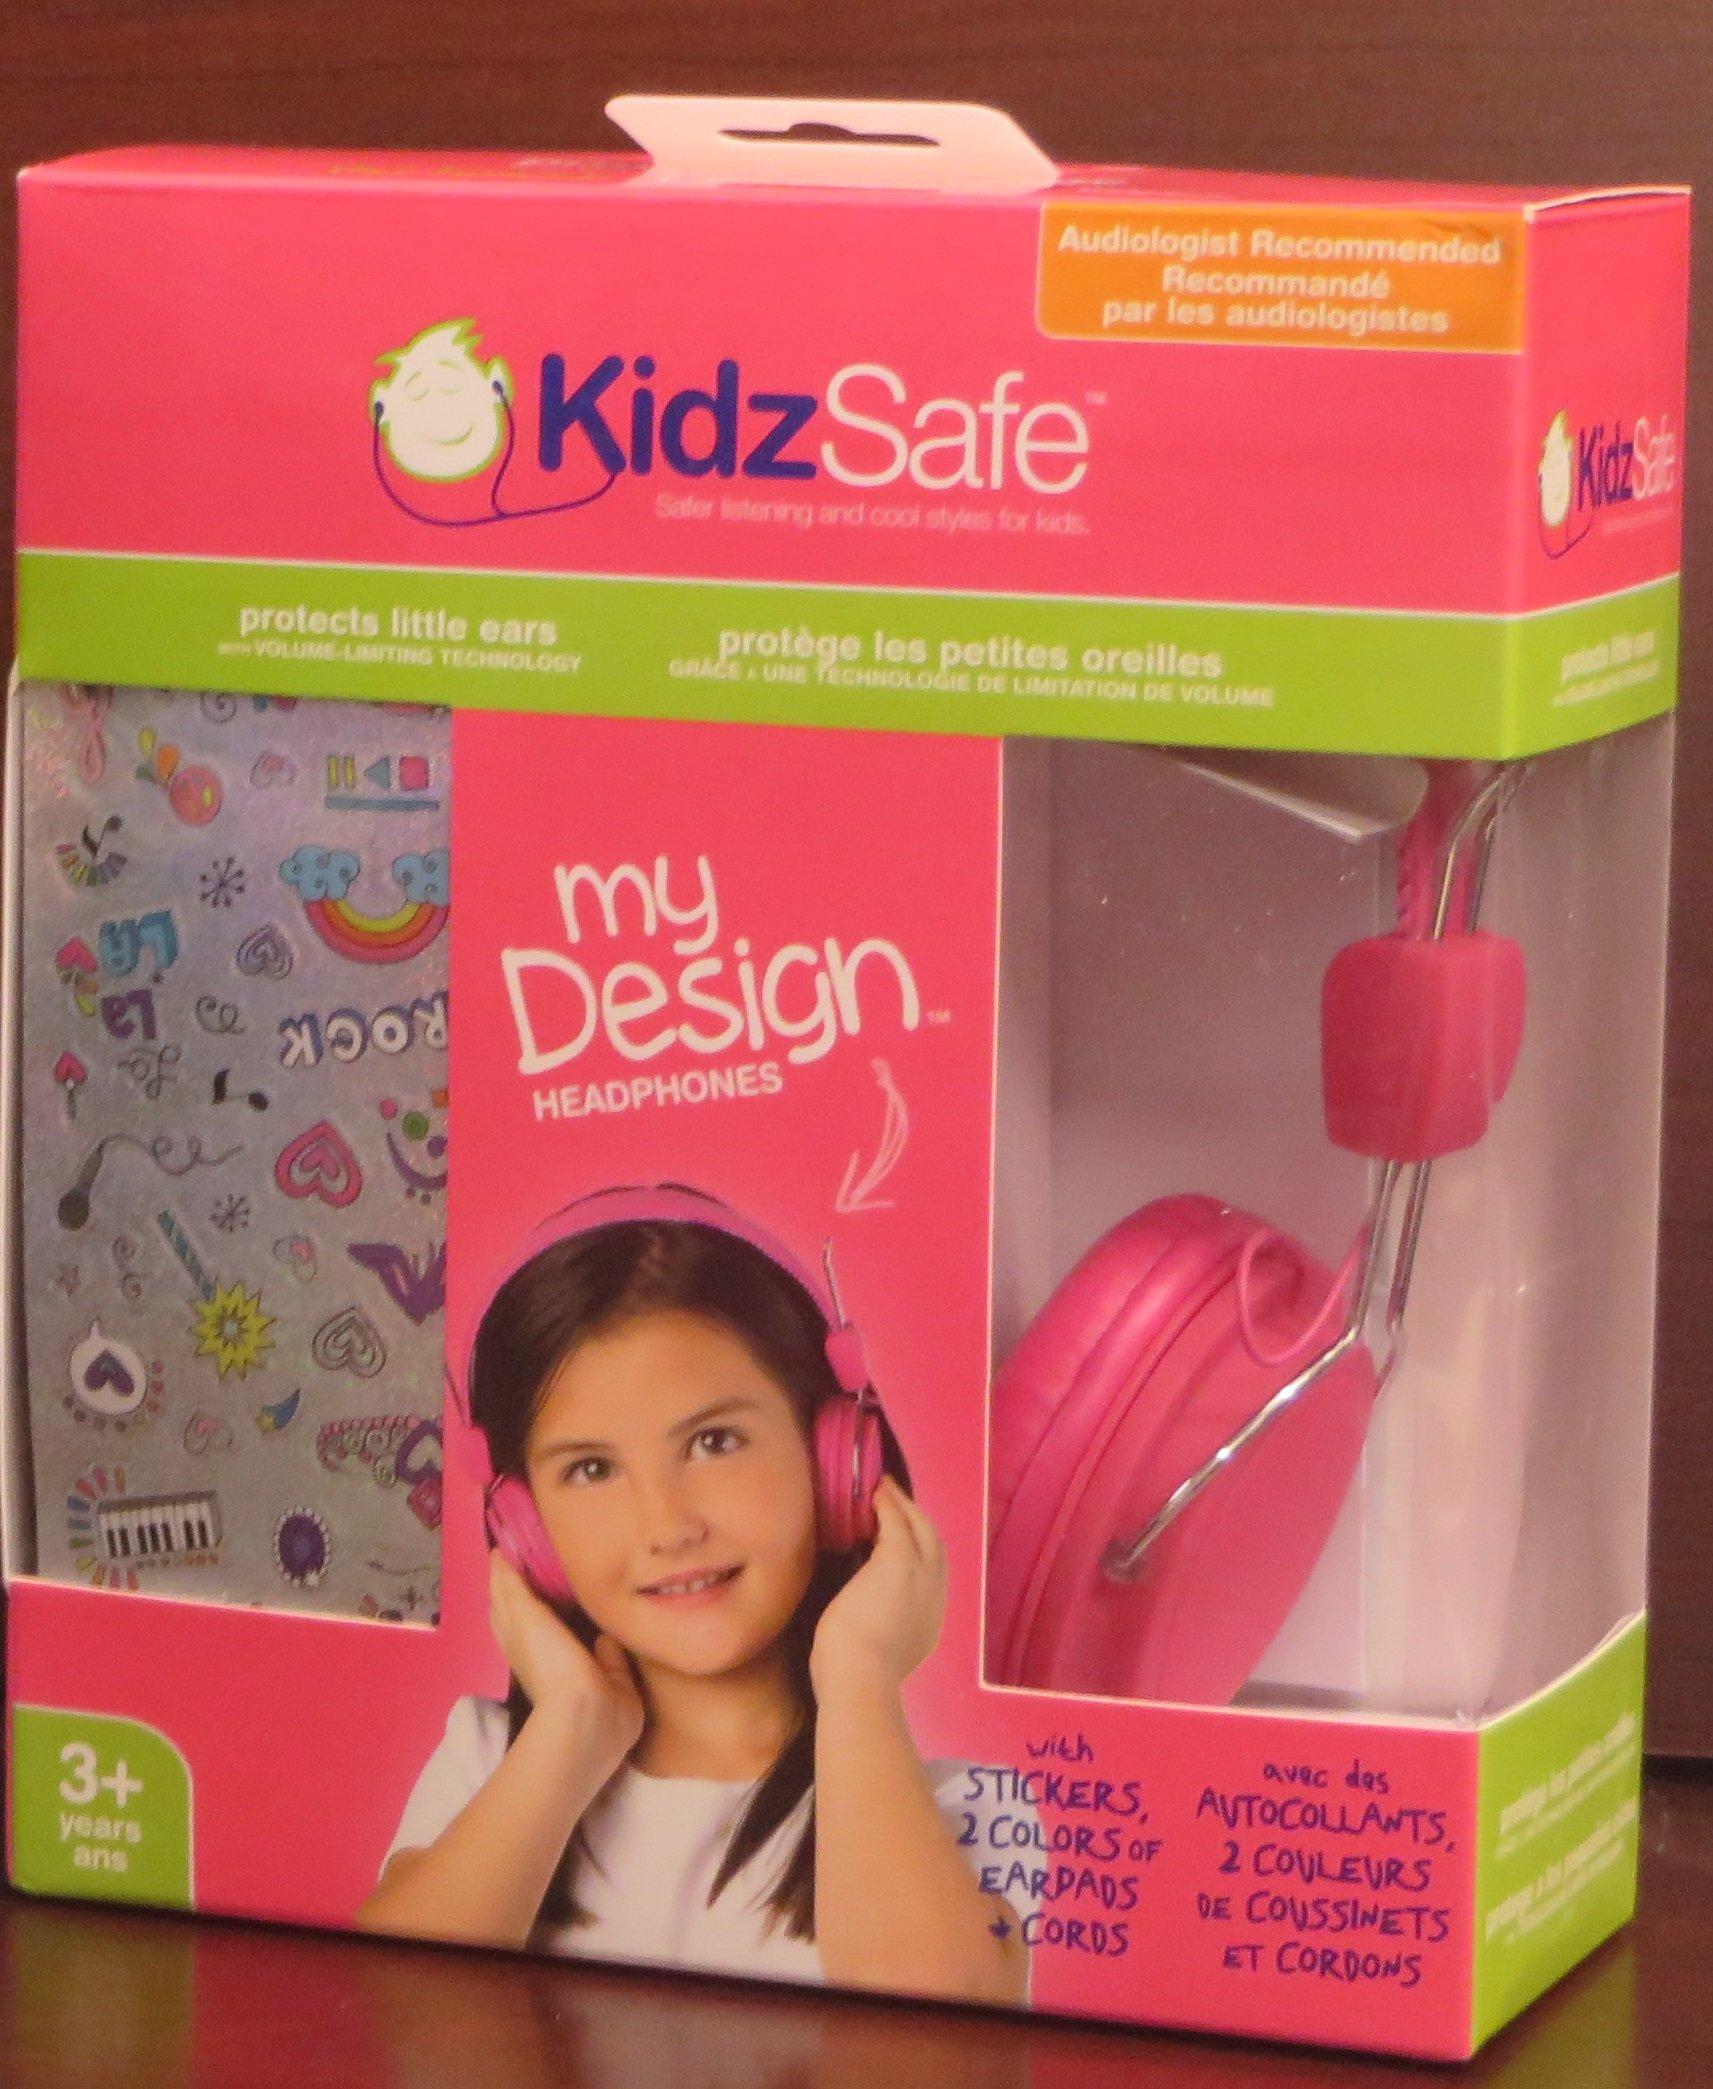 Kidz Safe my Design headphones by SMS audio (Image #1)